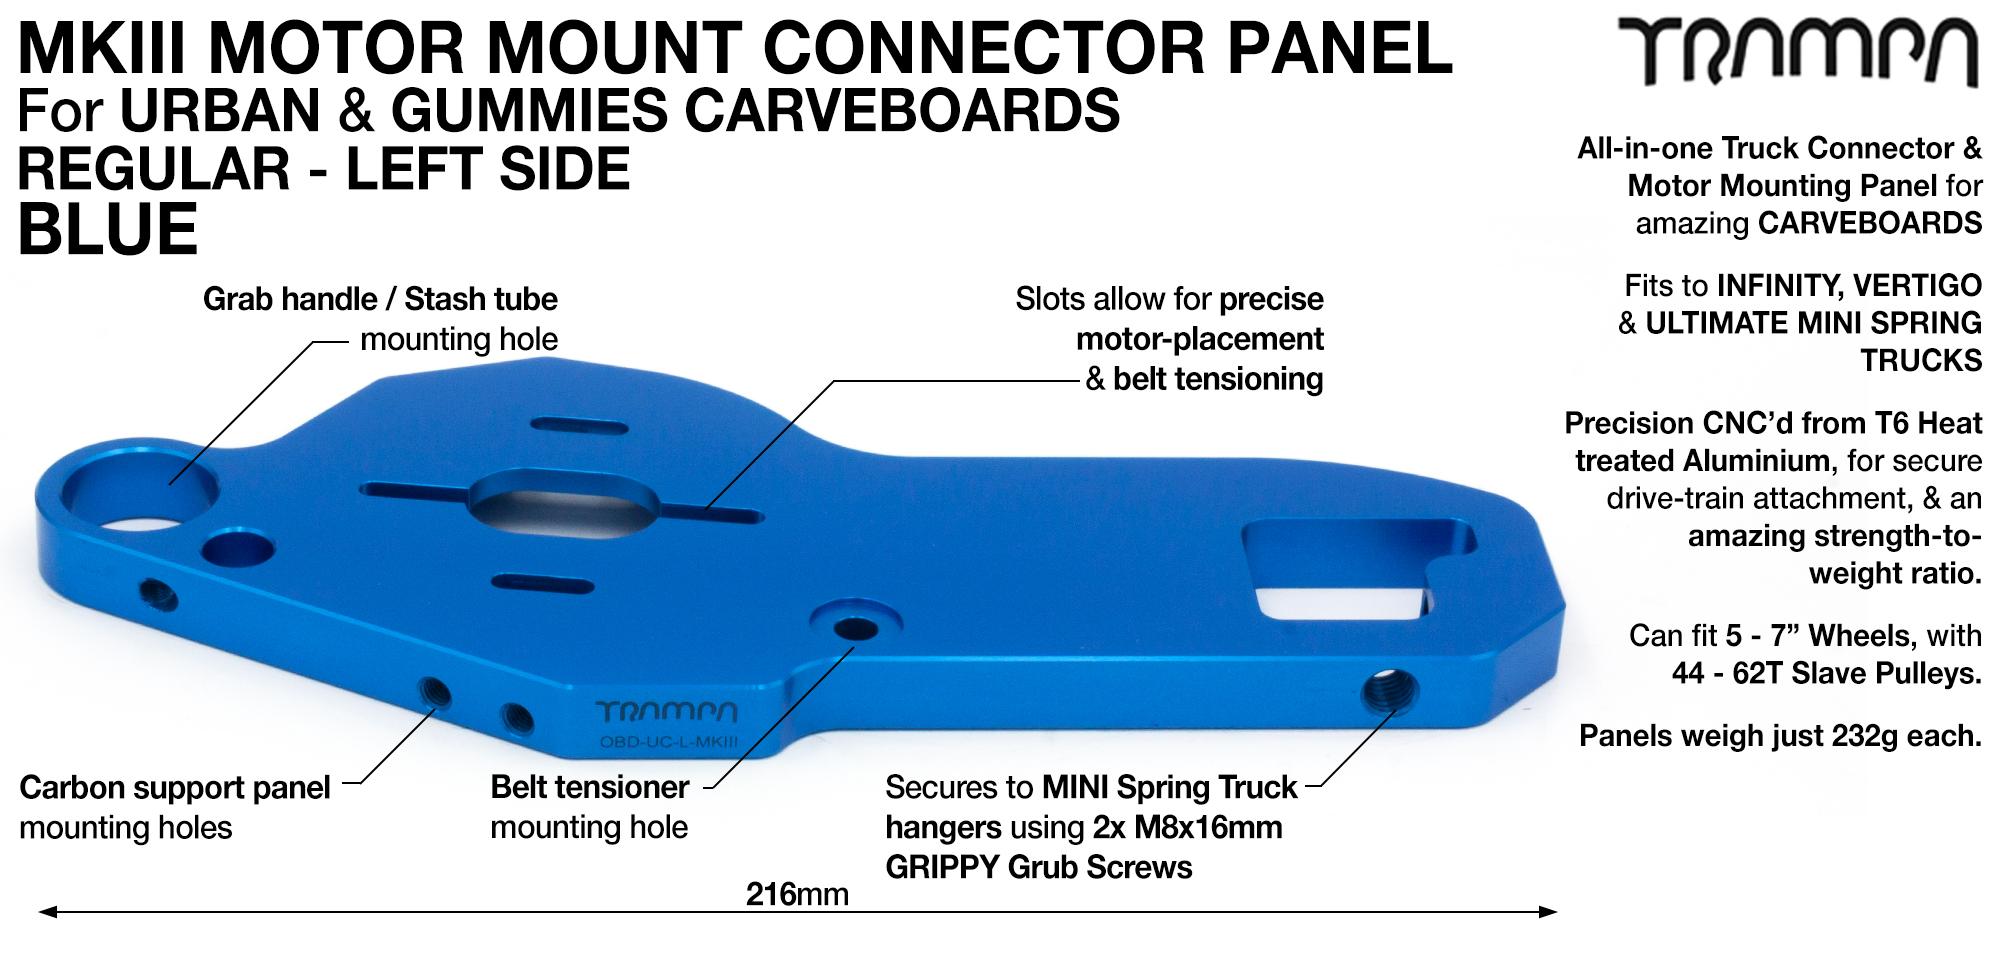 MkII URBAN CARVE Truck MOTOR MOUNT T6 Aluminium Anodised BLUE - REGULAR